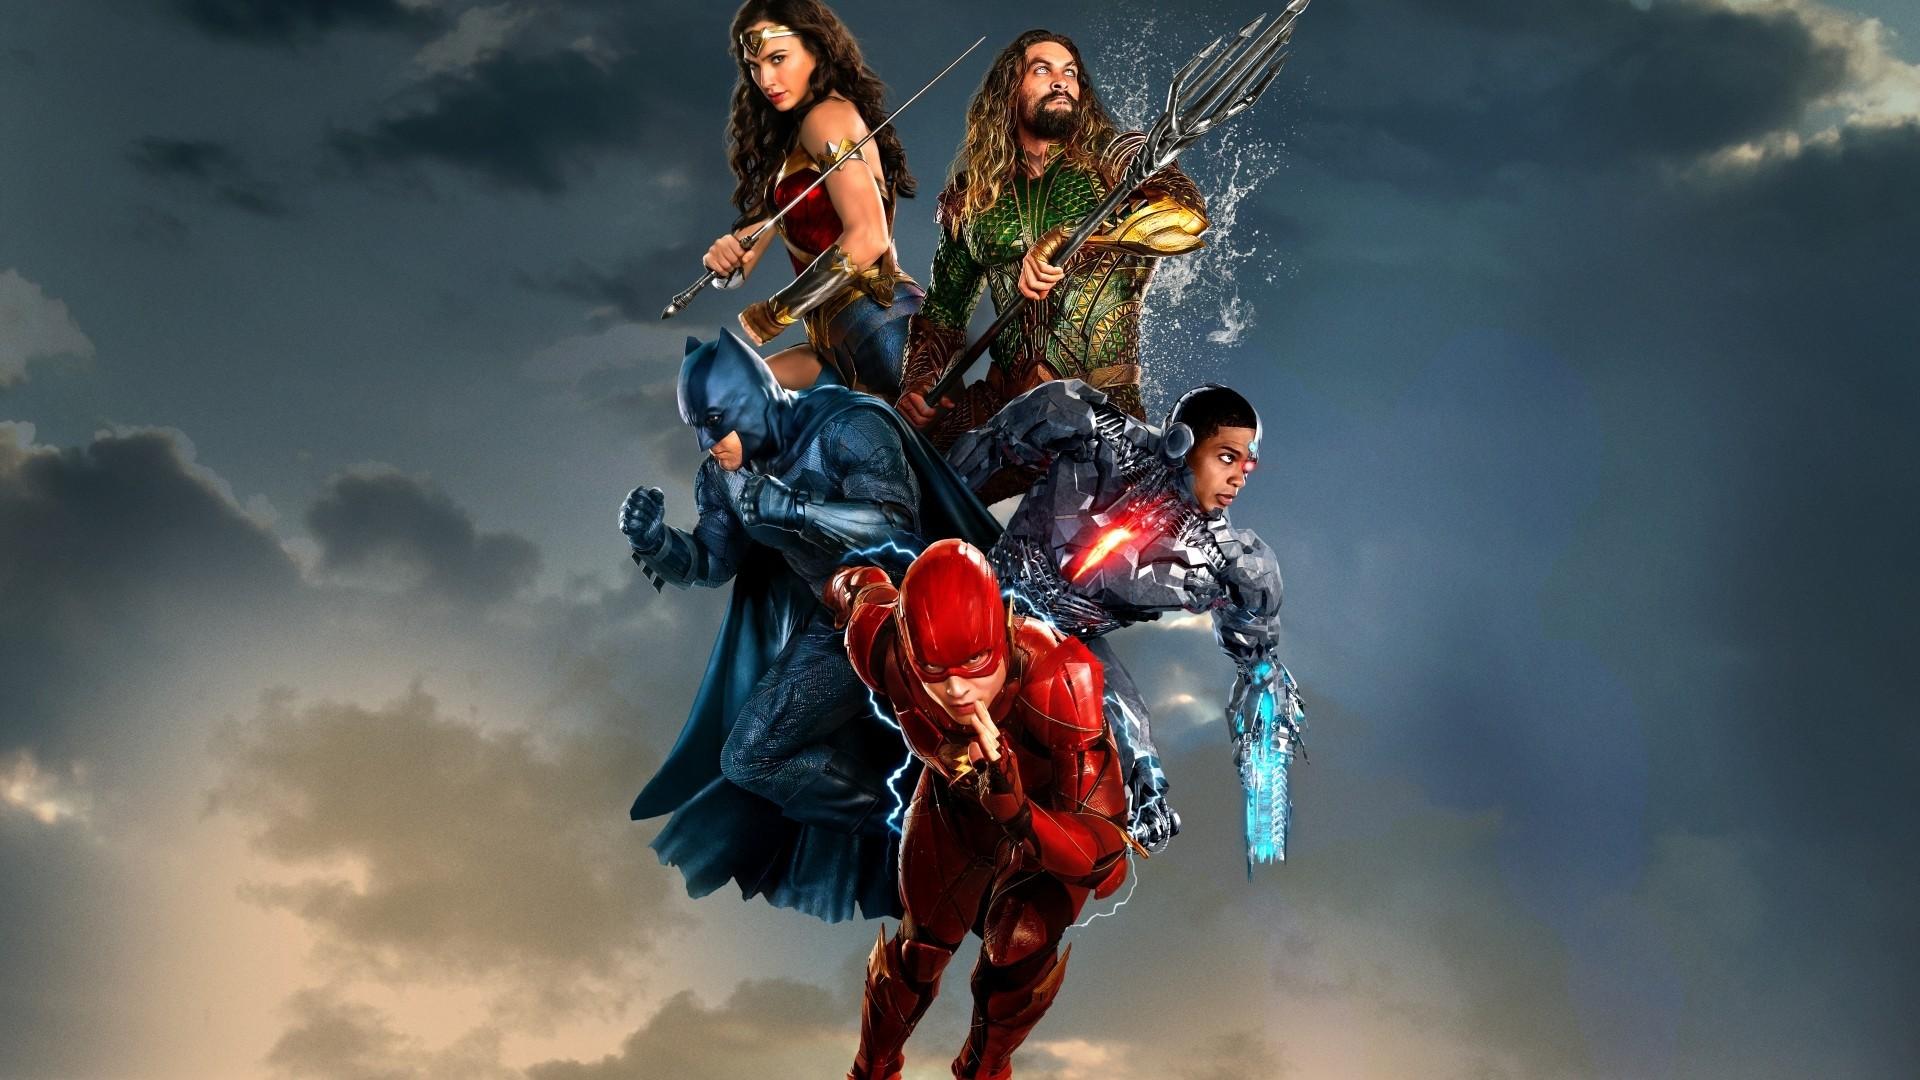 Justice League Poster HD Wallpaper